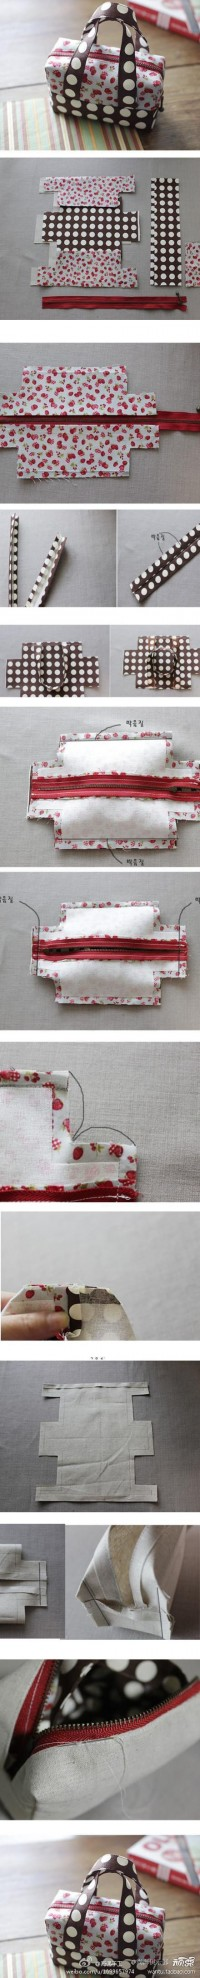 DIY Lunch Bag DIY Projects | UsefulDIY.com